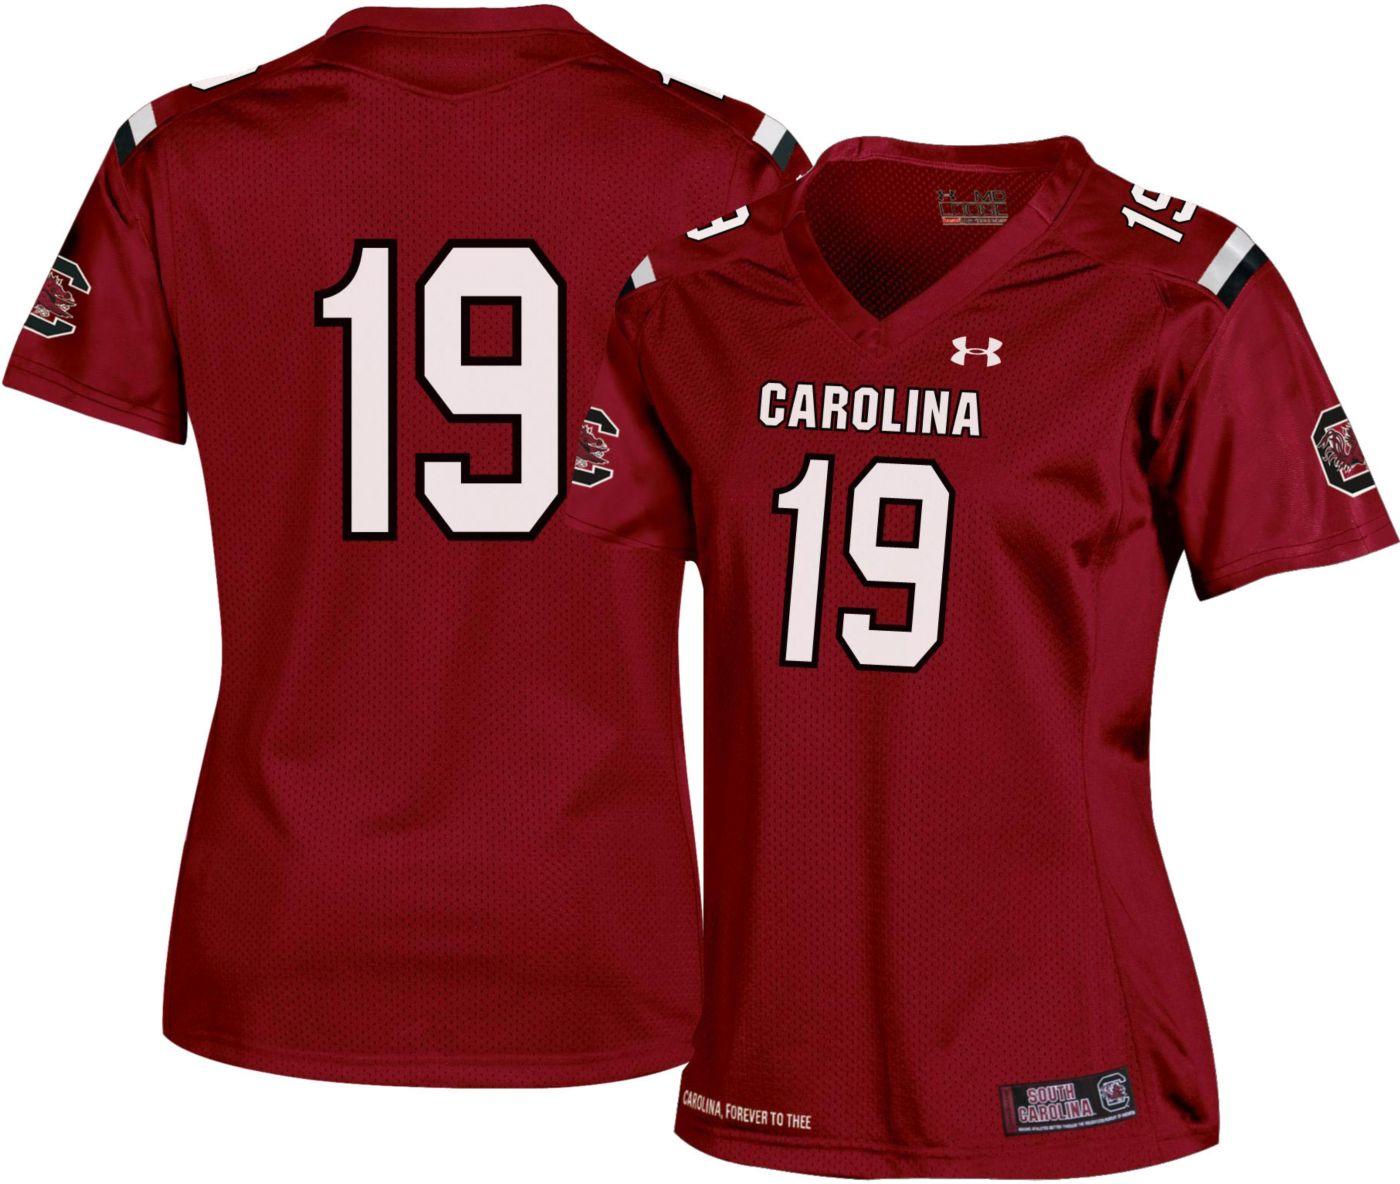 Under Armour Women's South Carolina Gamecocks #19 Garnet Replica Football Jersey